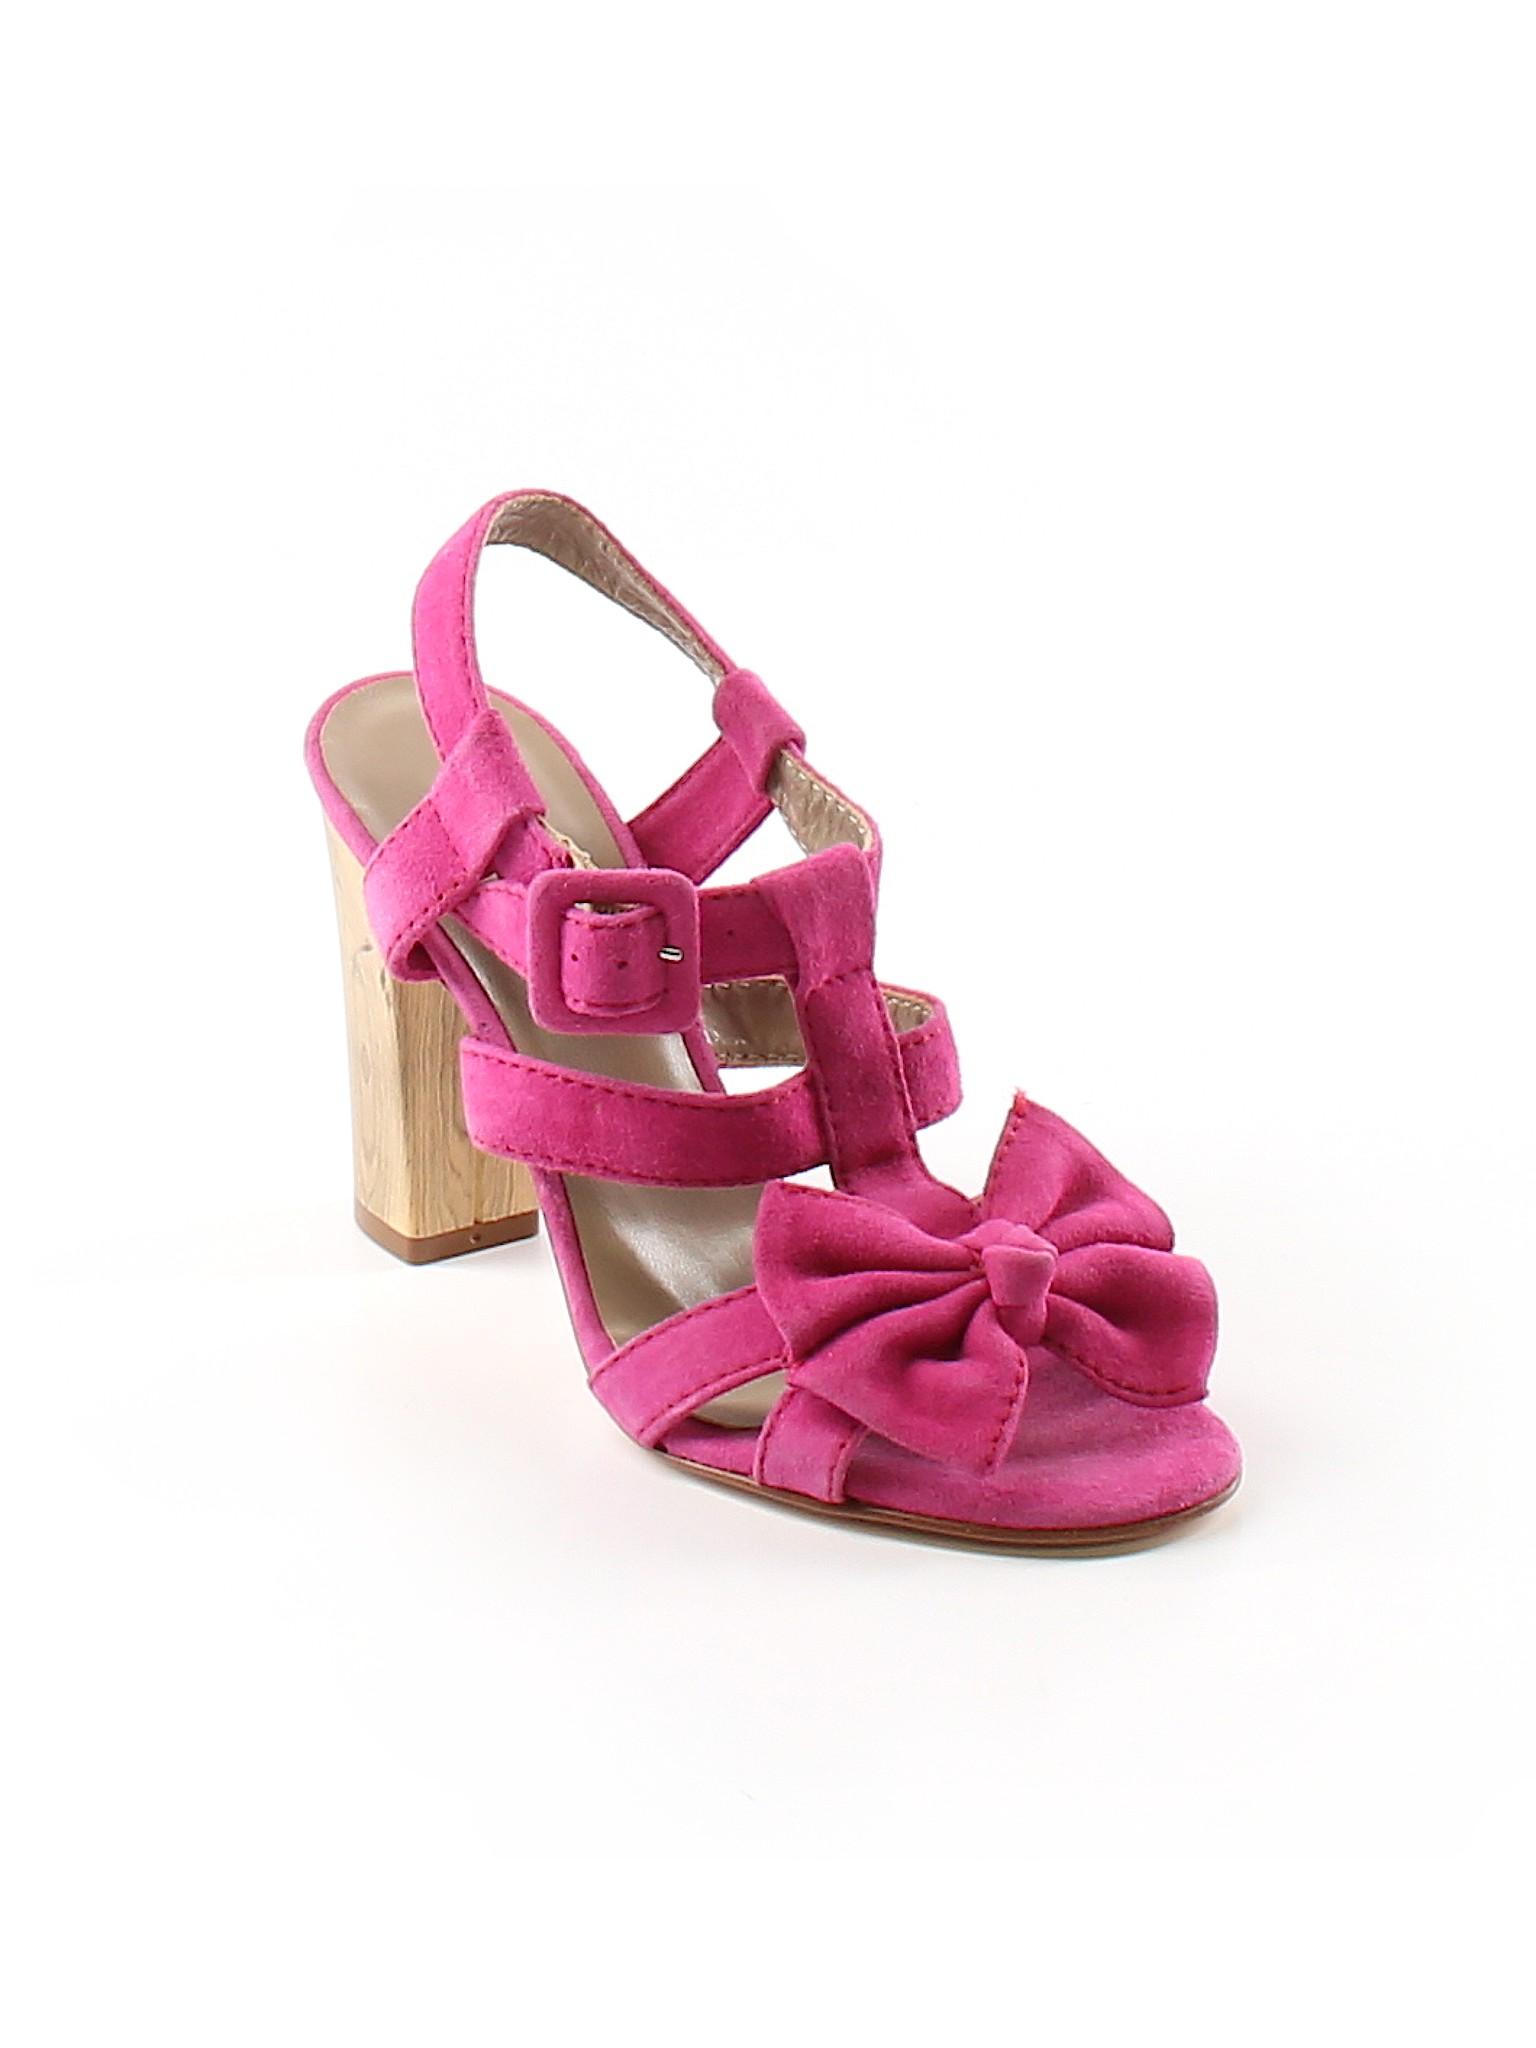 Lepore Nanette Nanette promotion Lepore Nanette Boutique Heels Boutique promotion Heels Boutique promotion IRvnSq